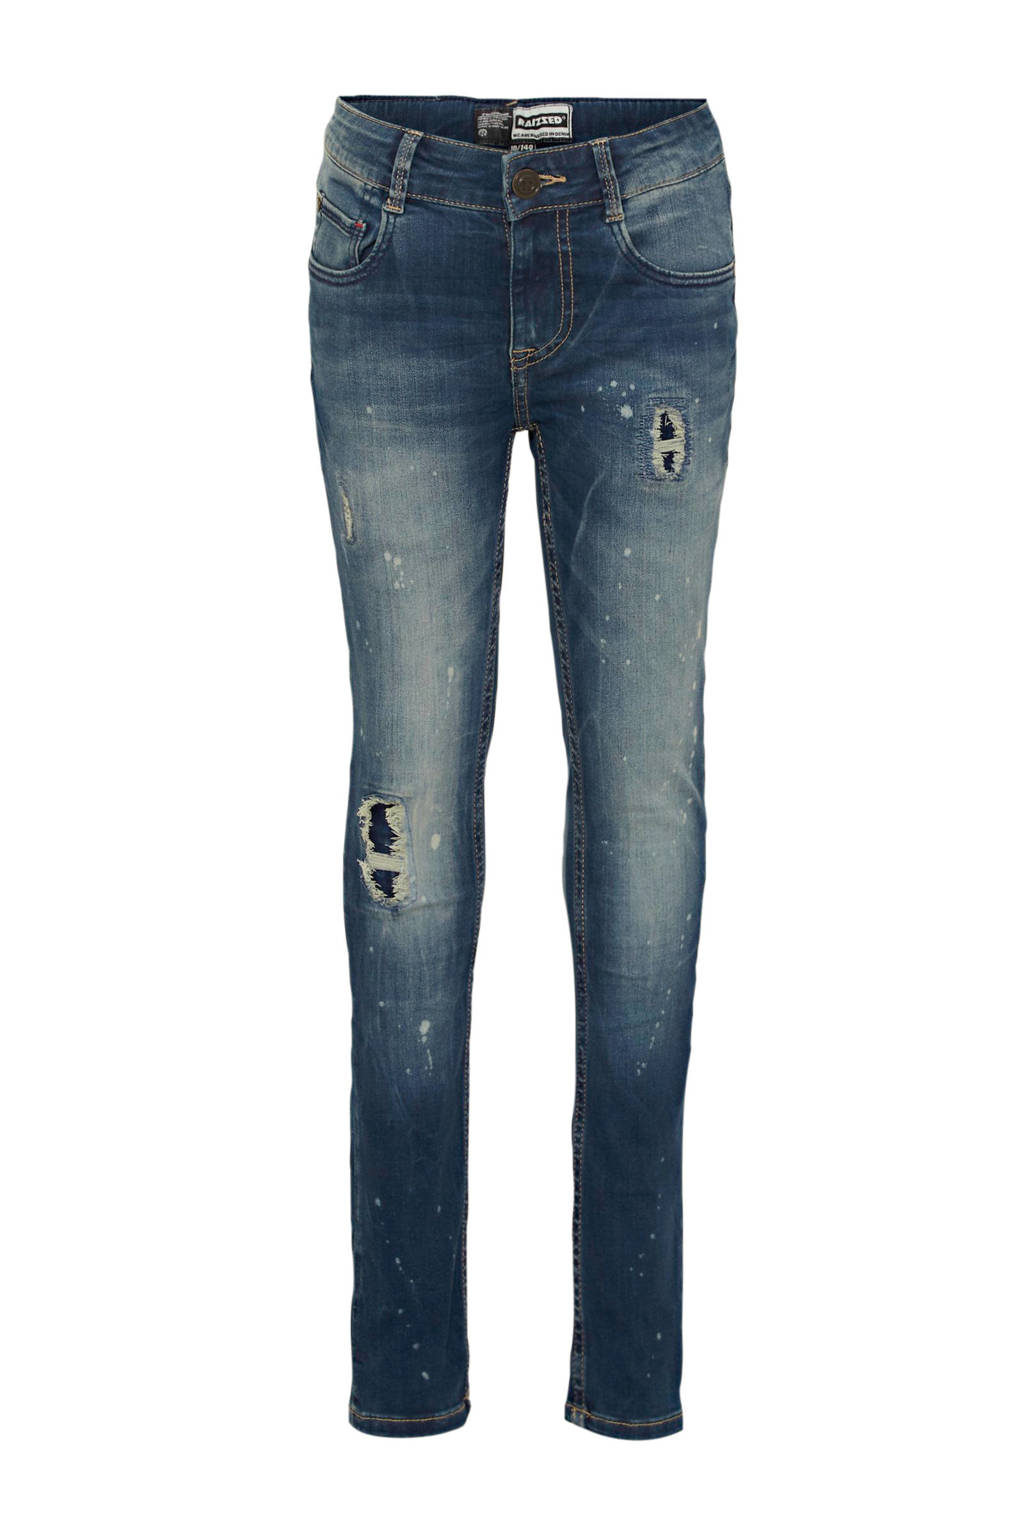 Raizzed skinny jeans Tokyo vintage blue, Vintage blue